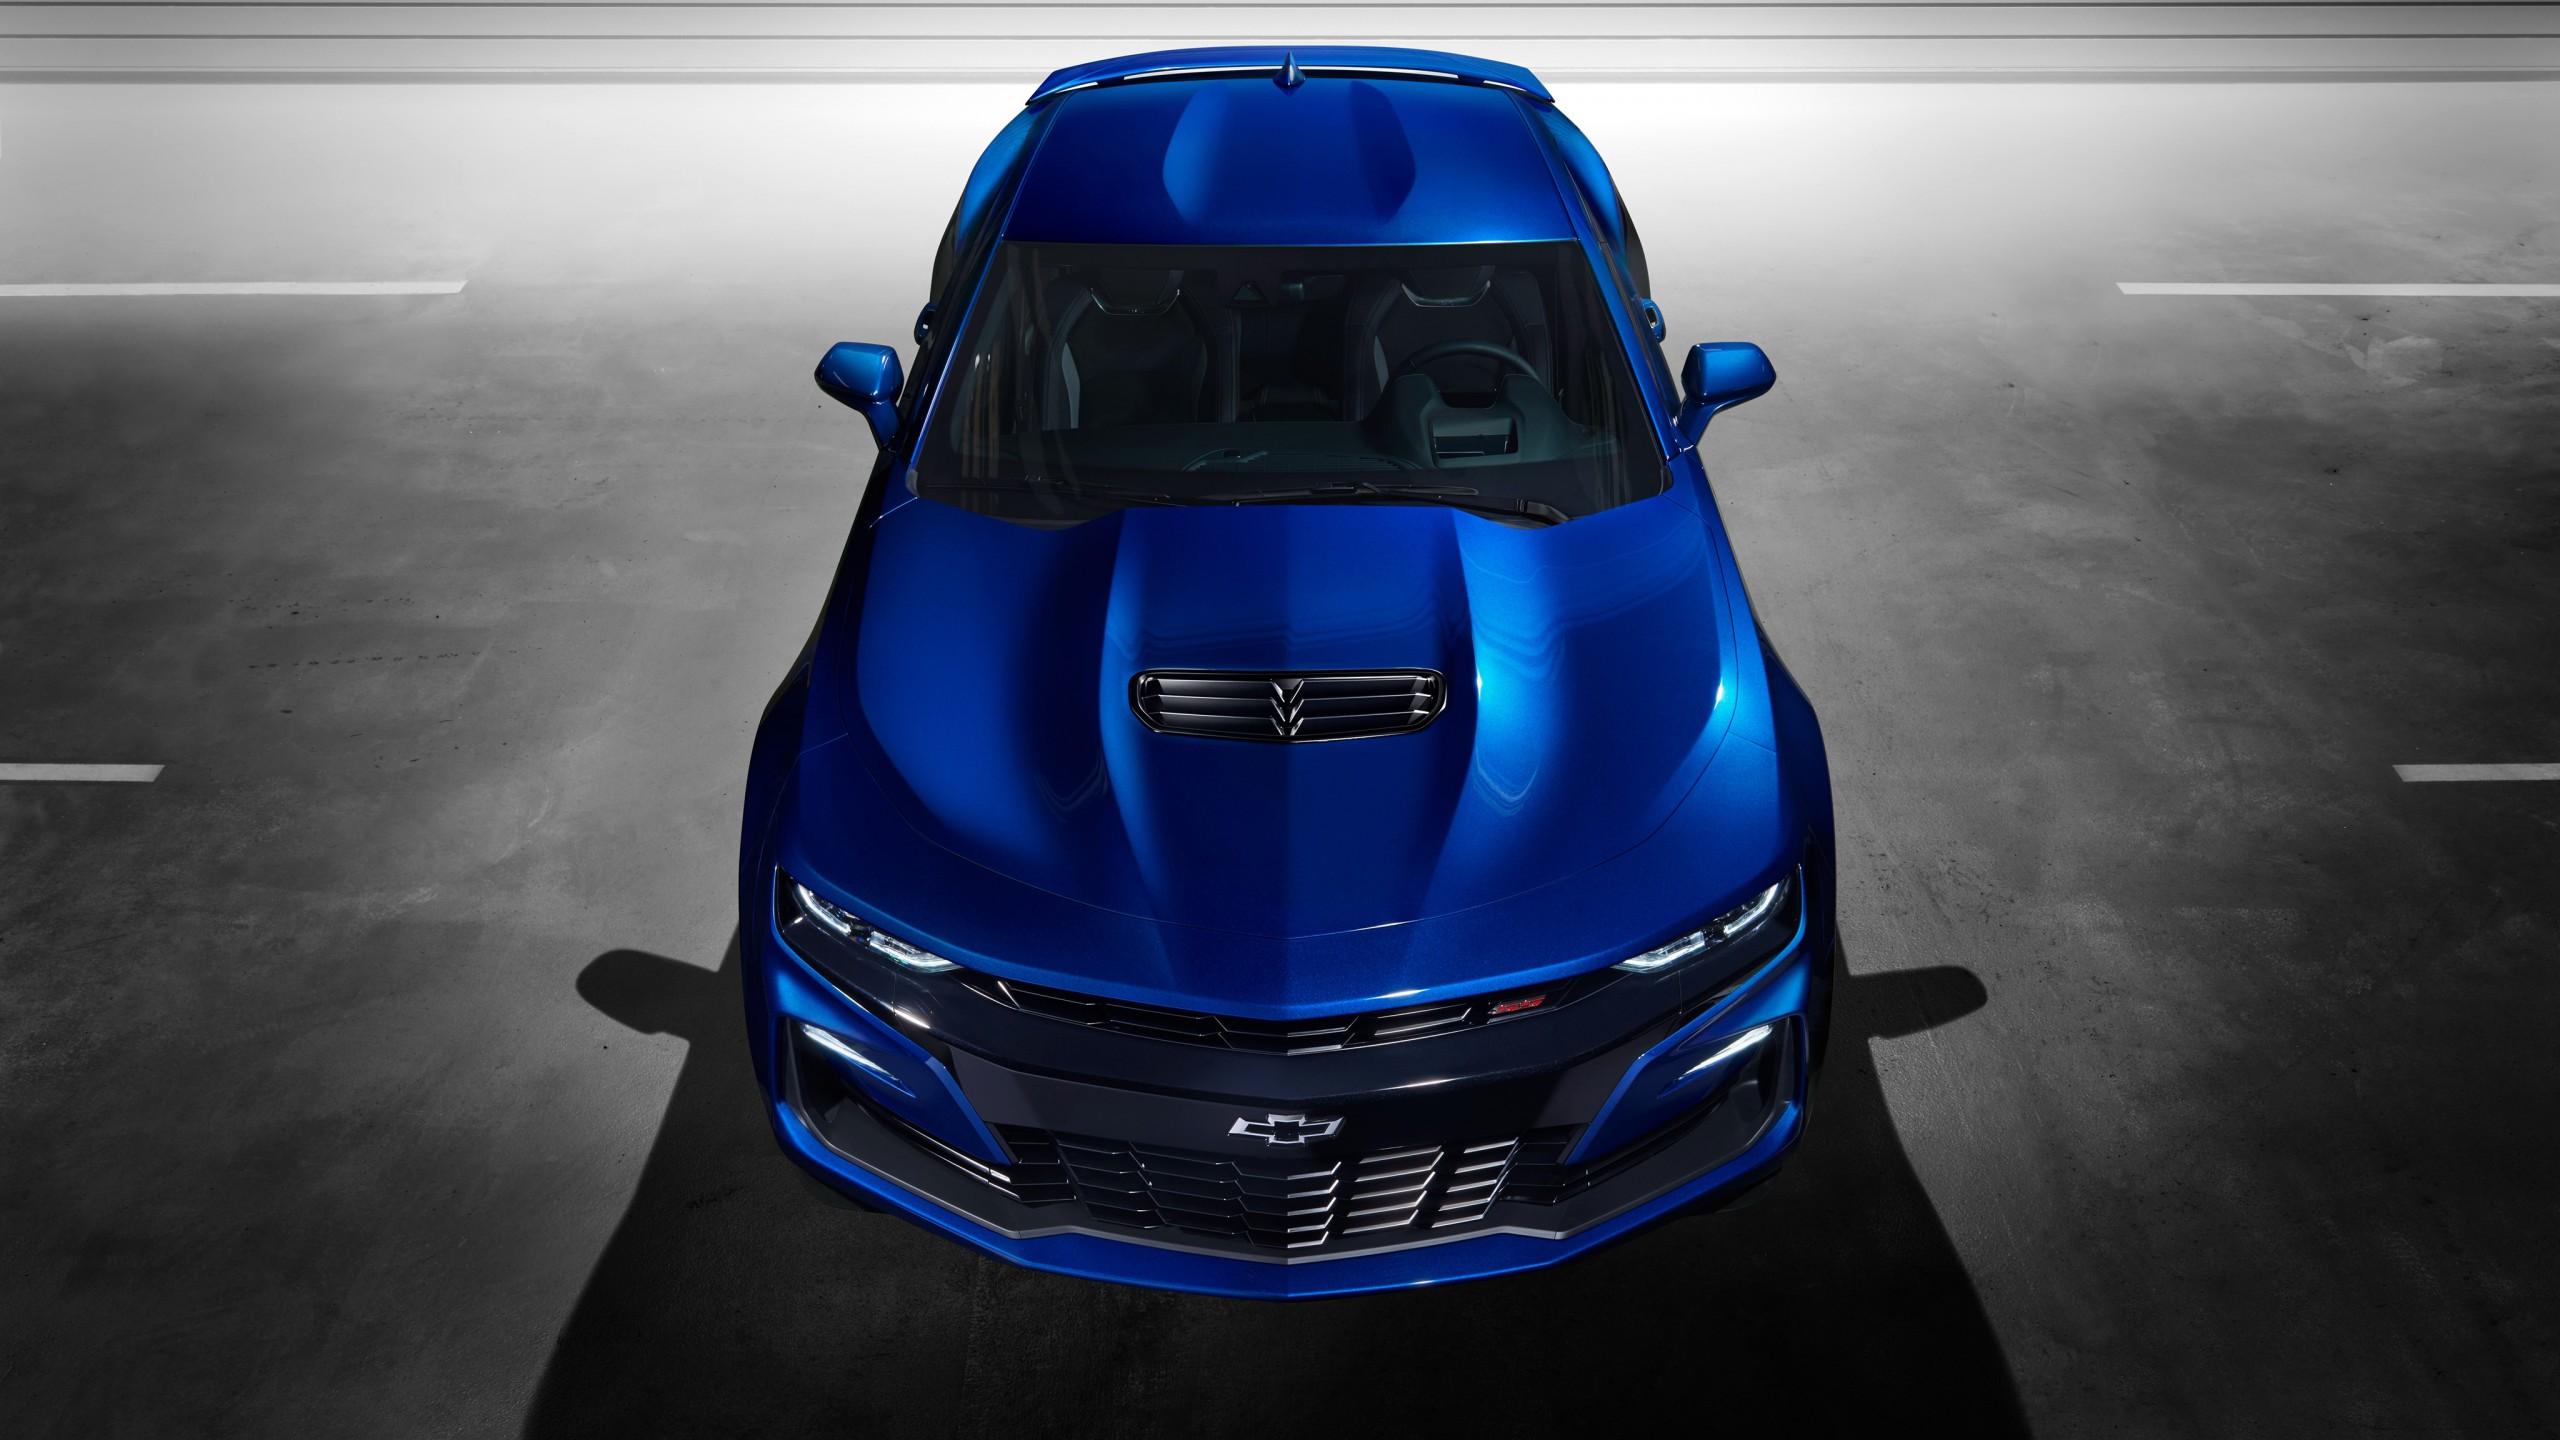 2019 Chevrolet Camaro SS 4K Wallpaper HD Car Wallpapers